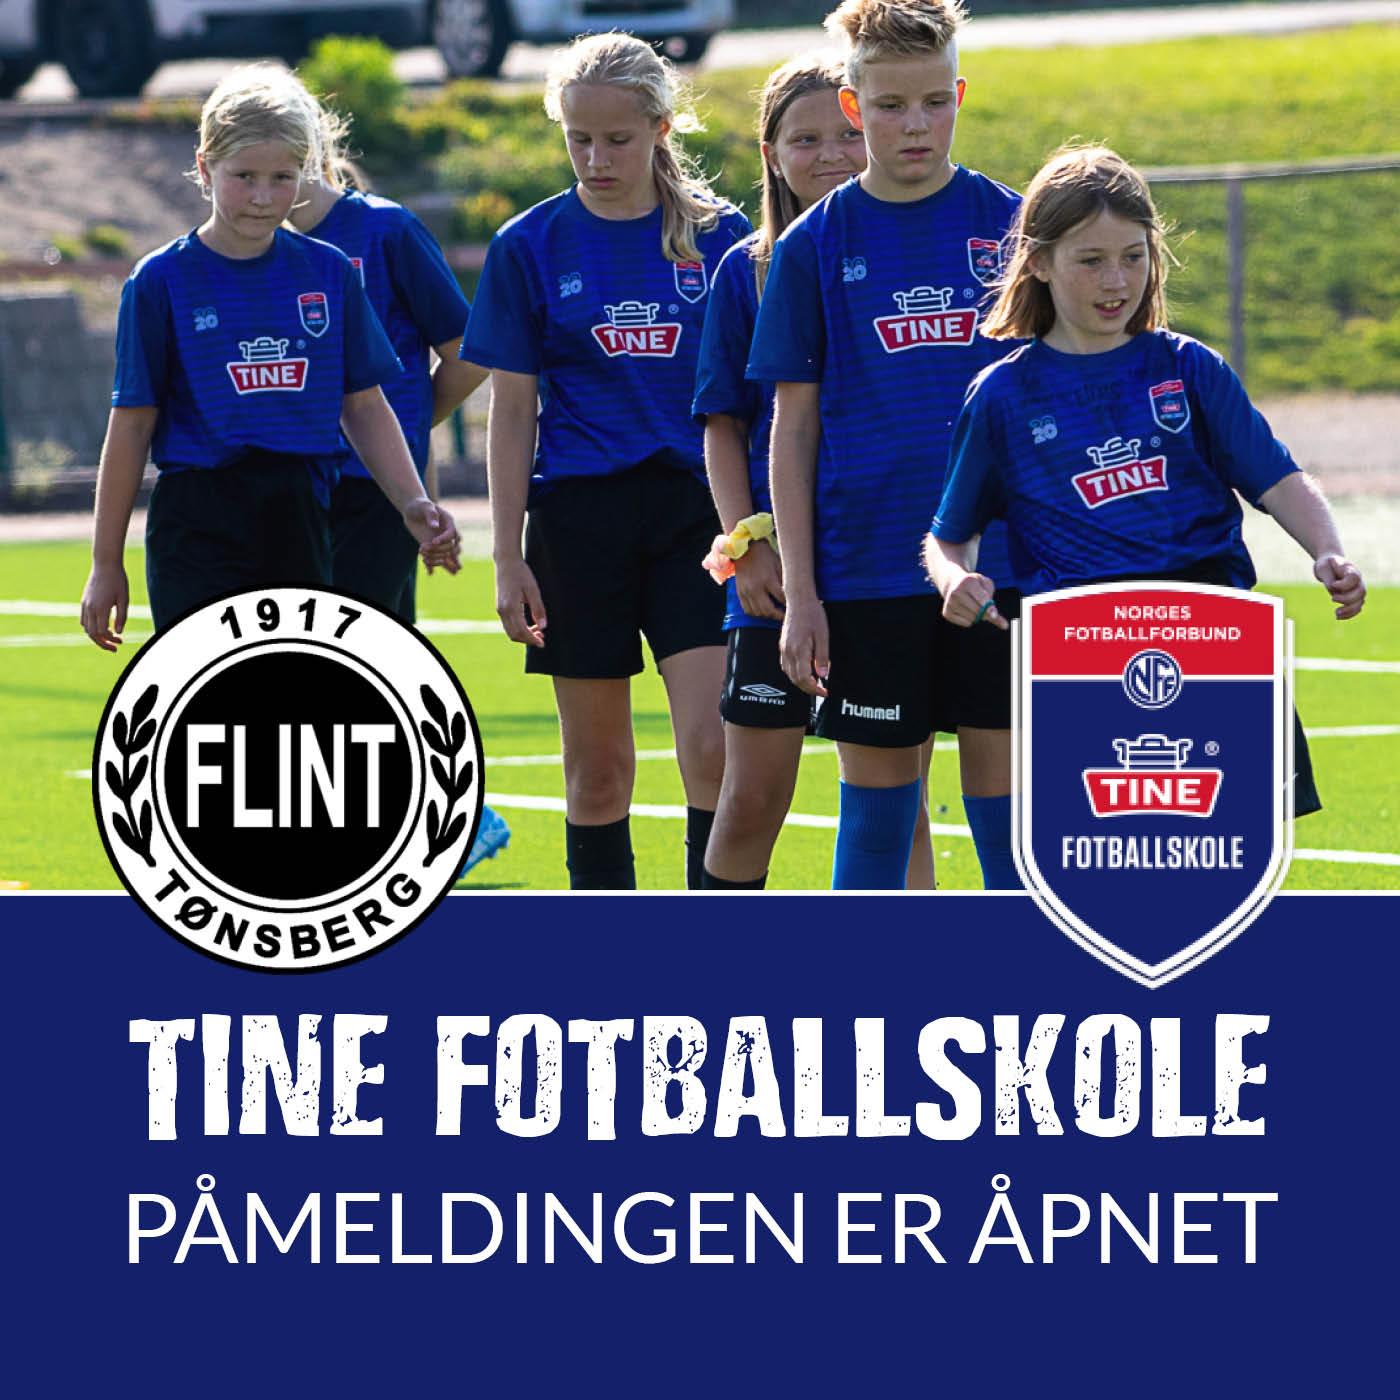 https://www.flintfotball.no/wp-content/uploads/2021/04/Tine-Fotballskole-FB-og-insta-PAMELDING-APNET.jpg